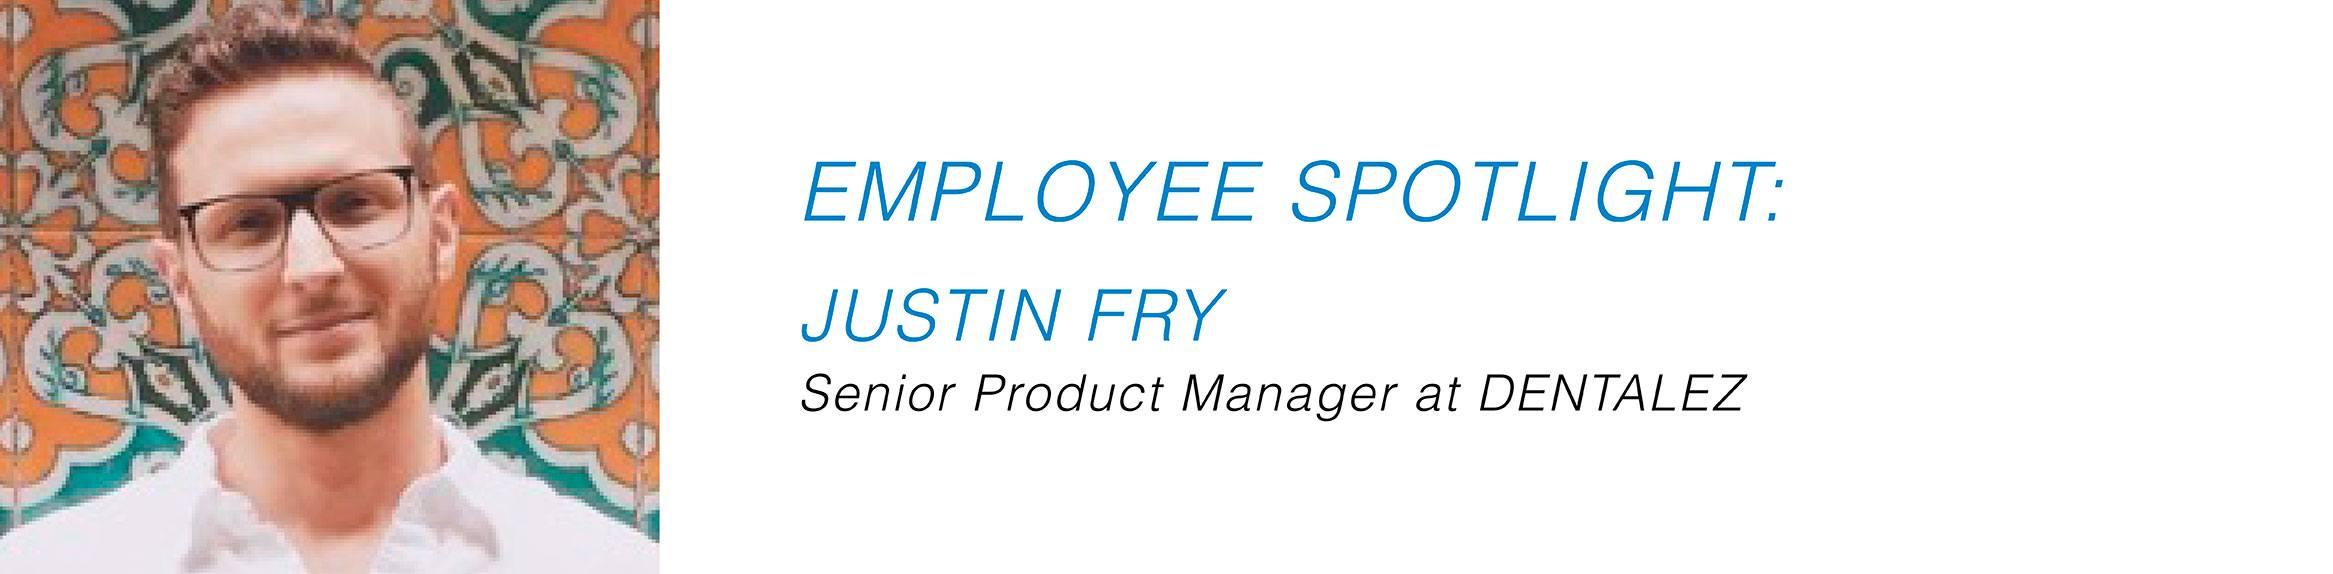 Employee Spotlight - Justin Fry